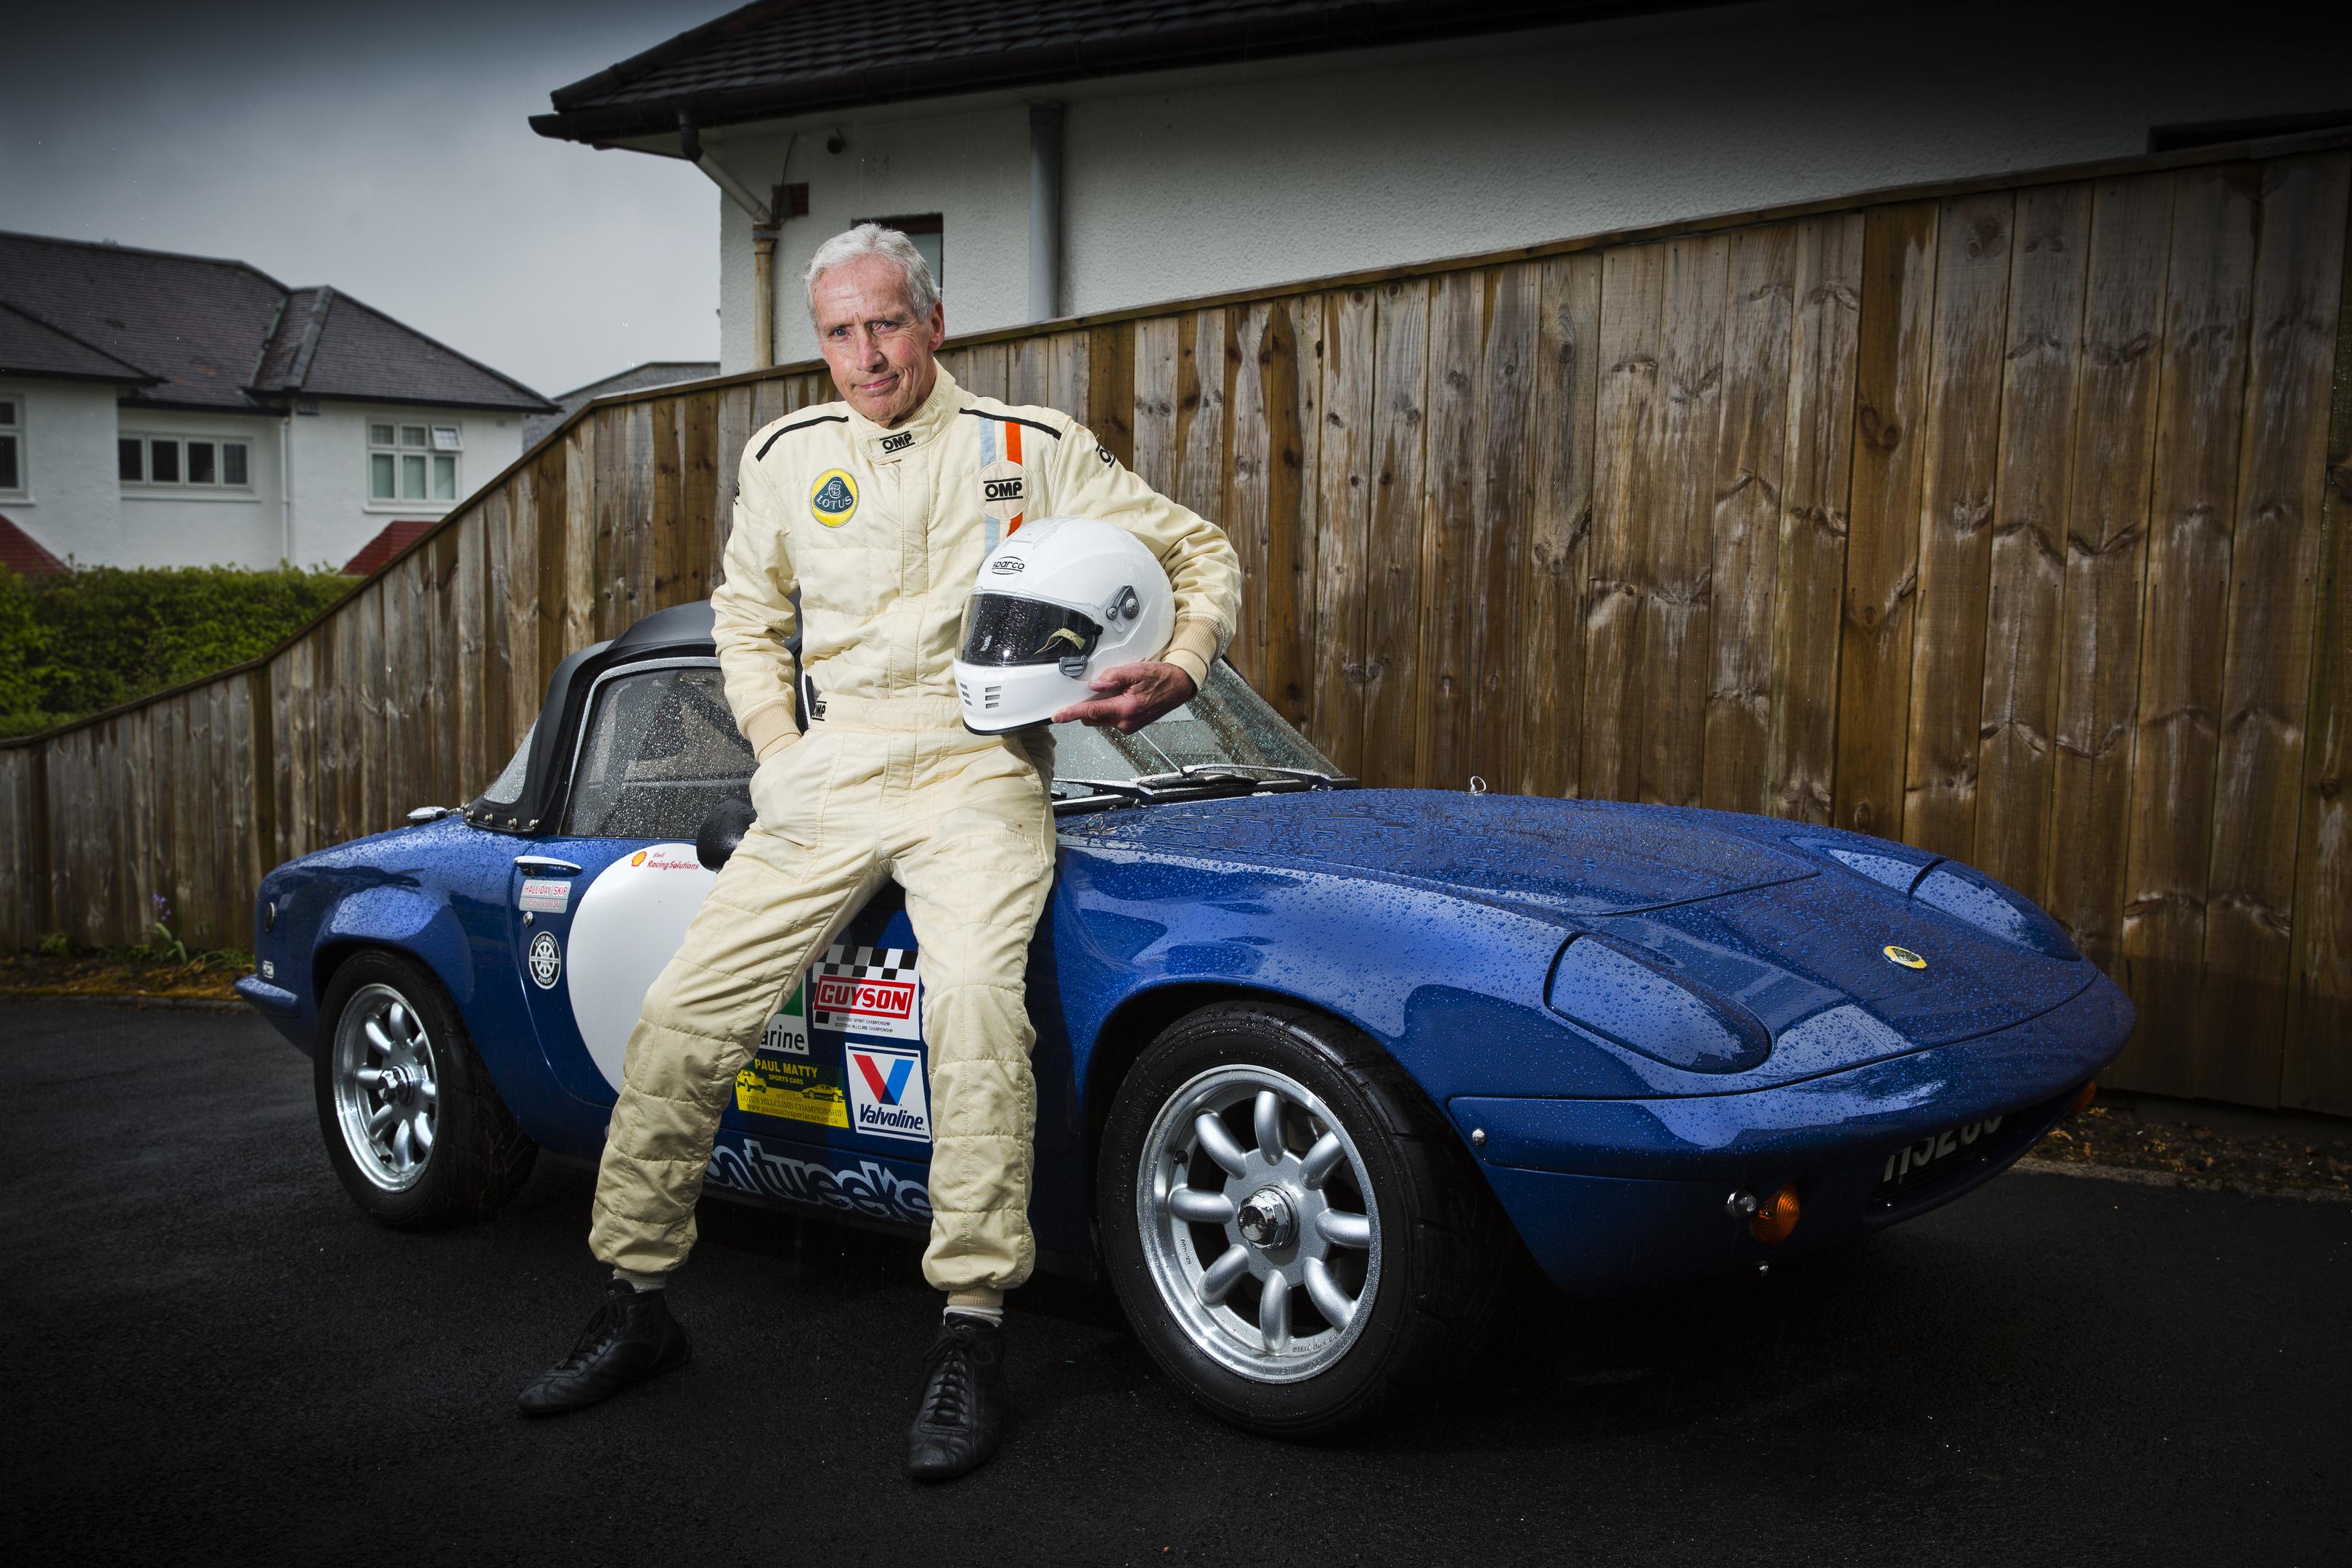 Richard Swindall at 82 still races his 1970 Lotus Elan S4 (Jamie Williamson)